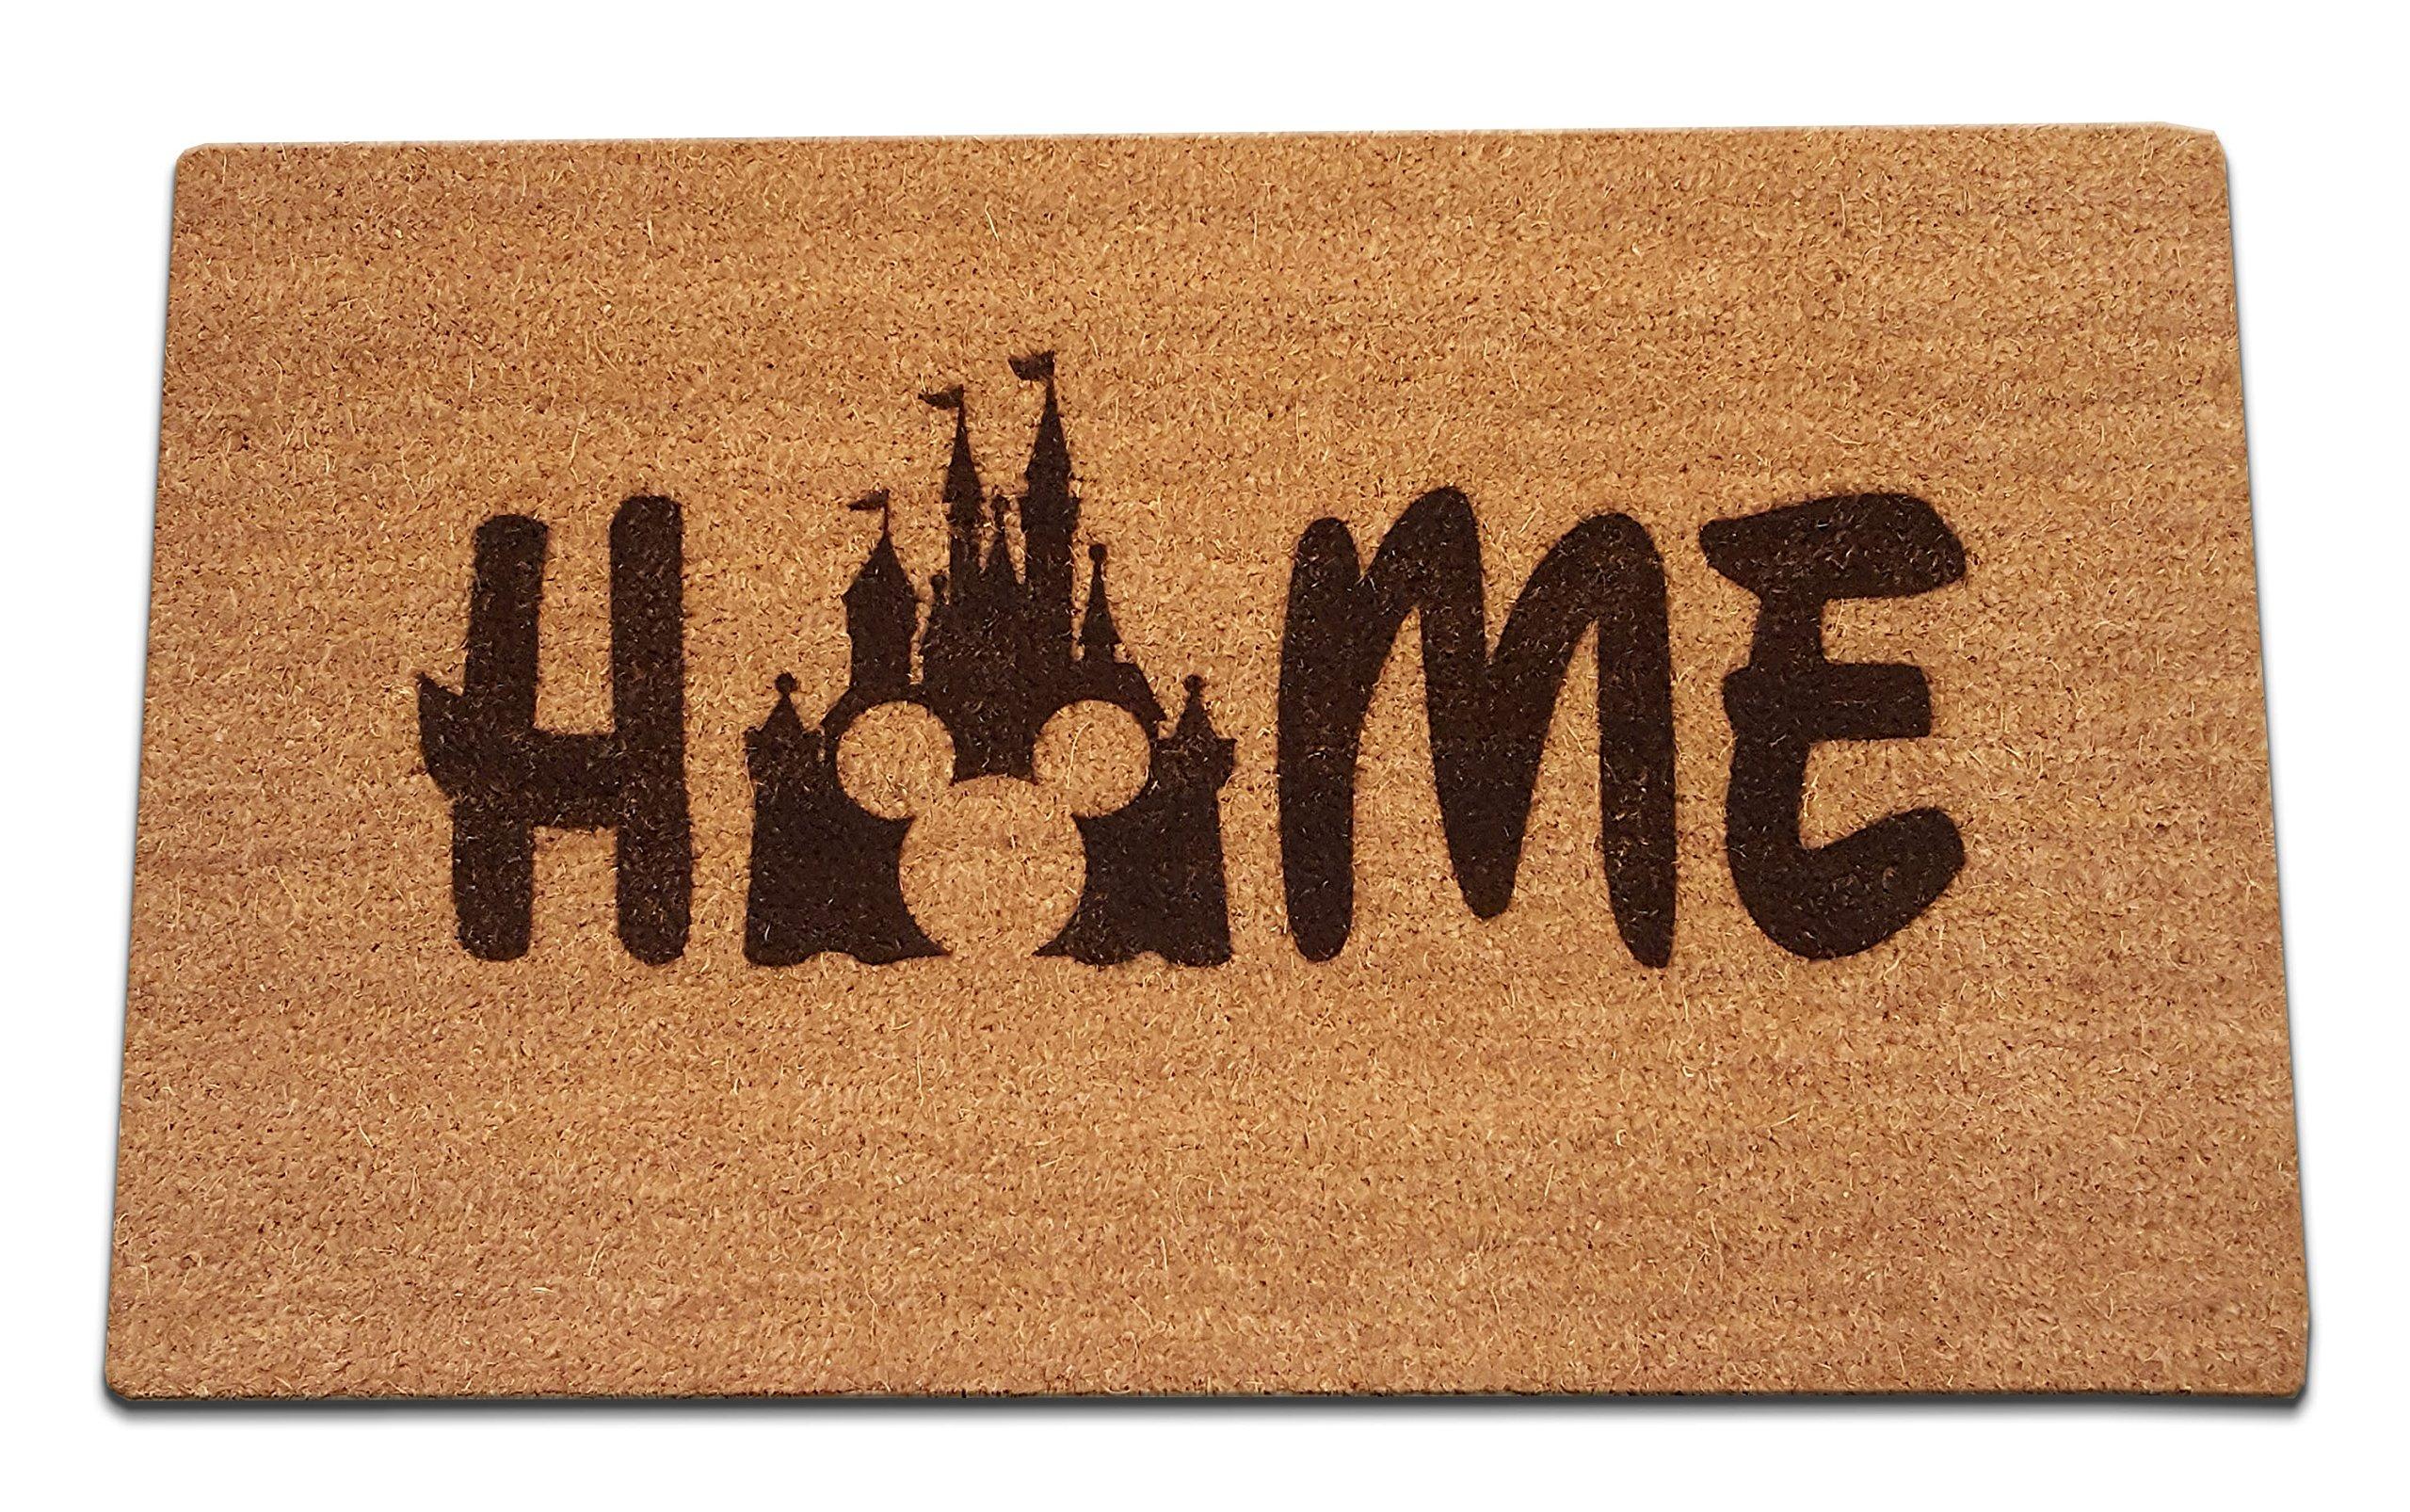 "Disney Mickey Mouse Castle Home Laser Engraved Coir Fiber Welcome Doormat 30"" x 18"""